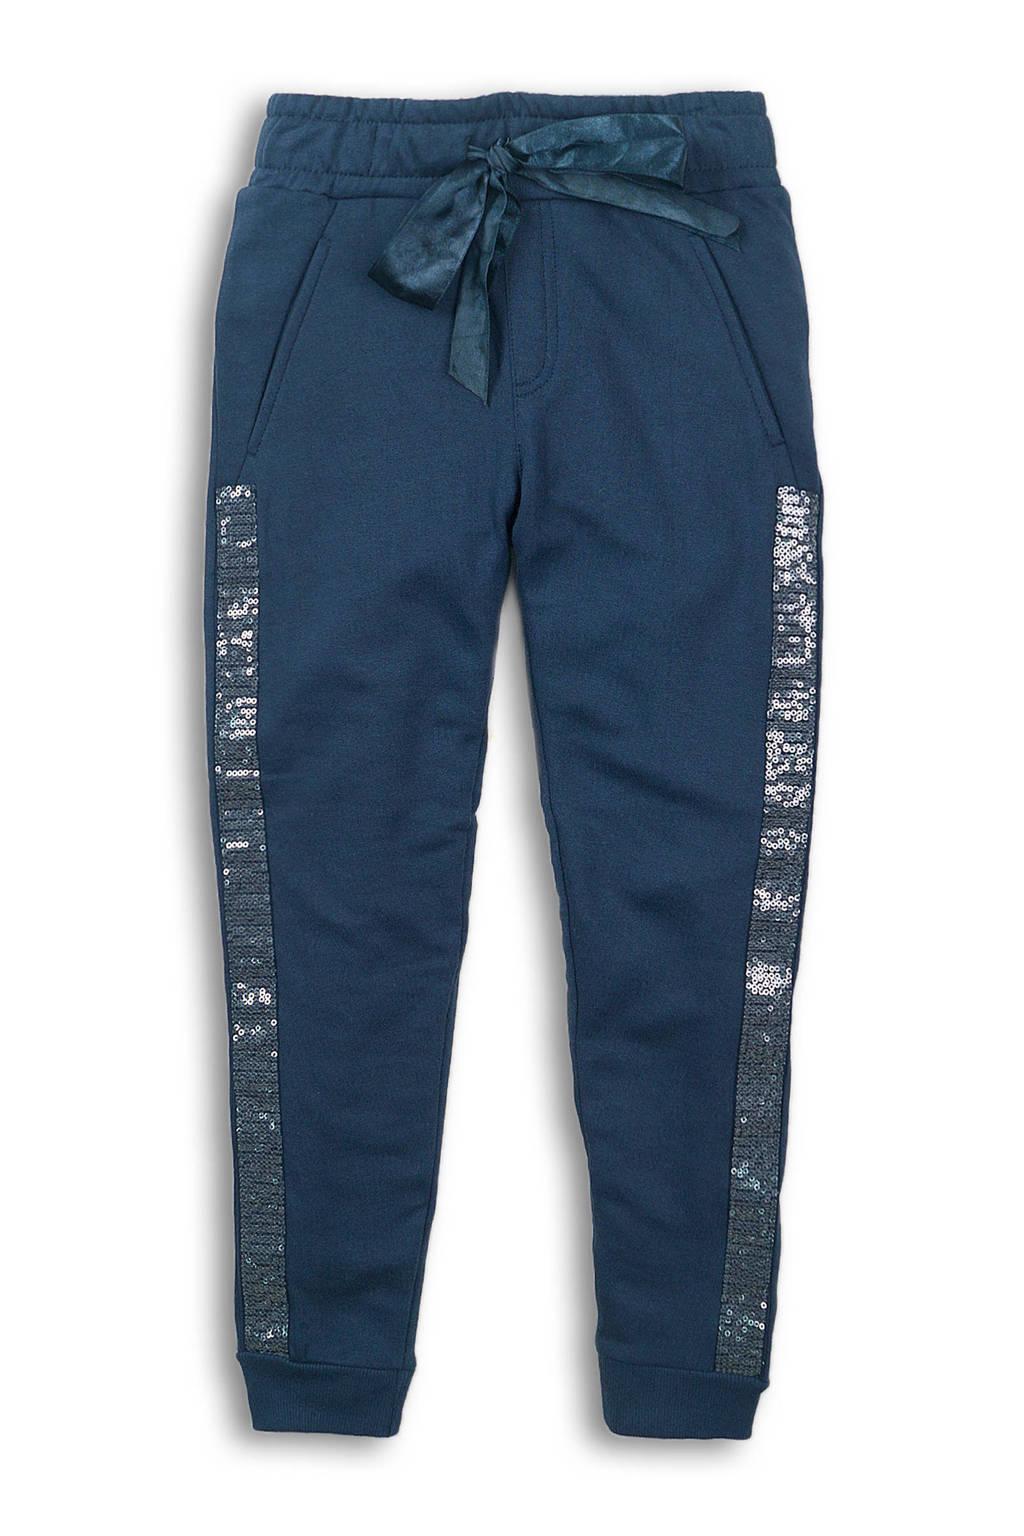 DJ Dutchjeans sweatpants met pailletten donkerblauw, Donkerblauw